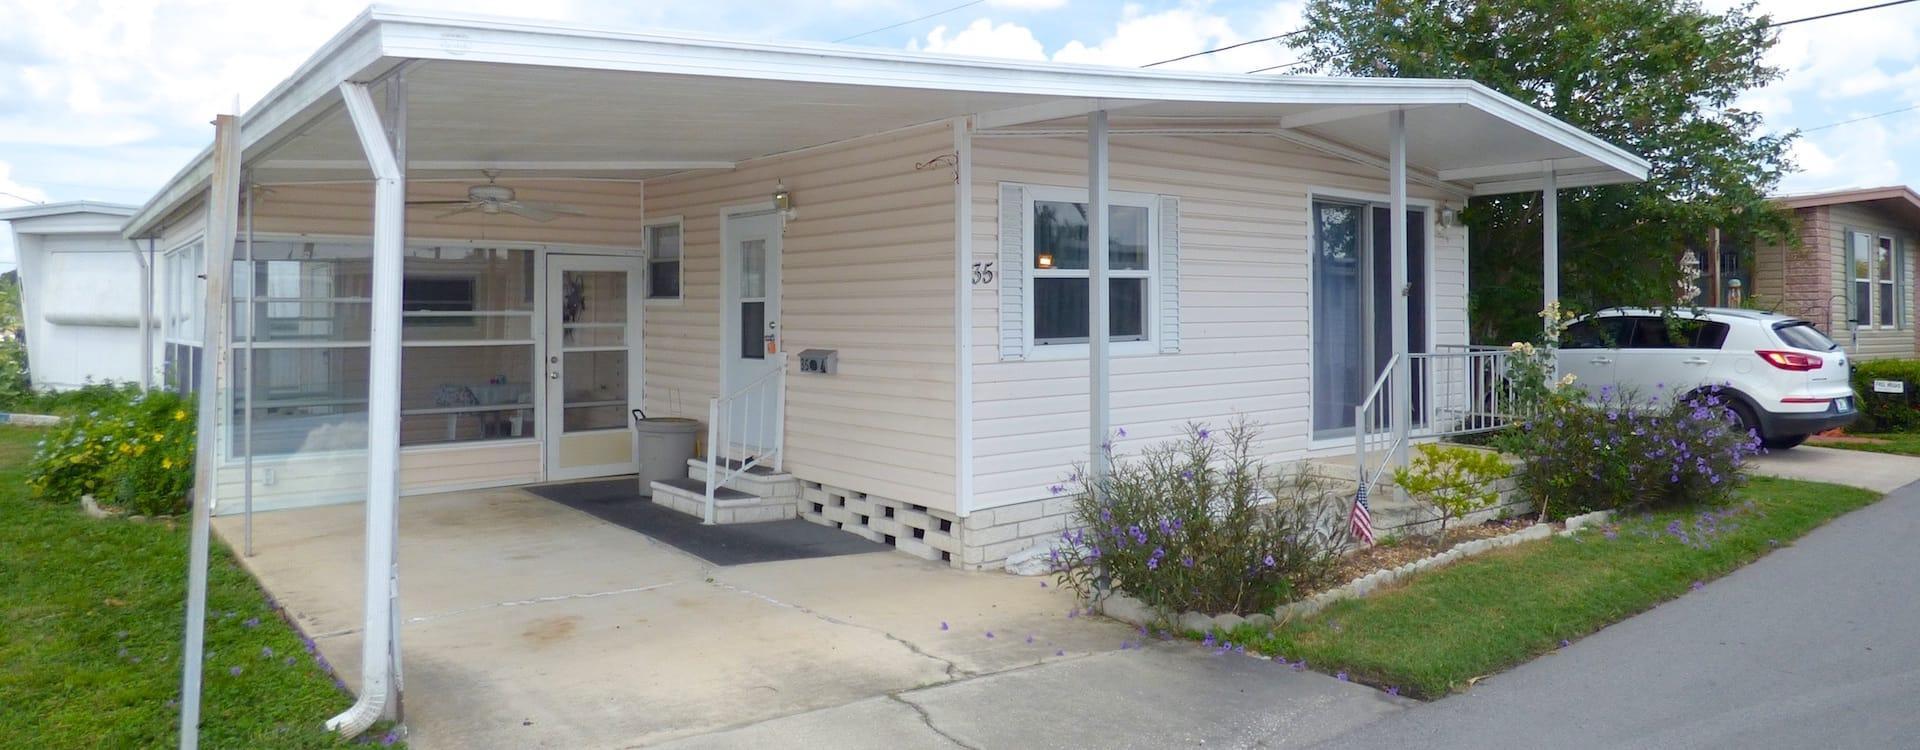 mobile home for sale saint petersburg fl sunshine mobile home rh sunsetmhs com